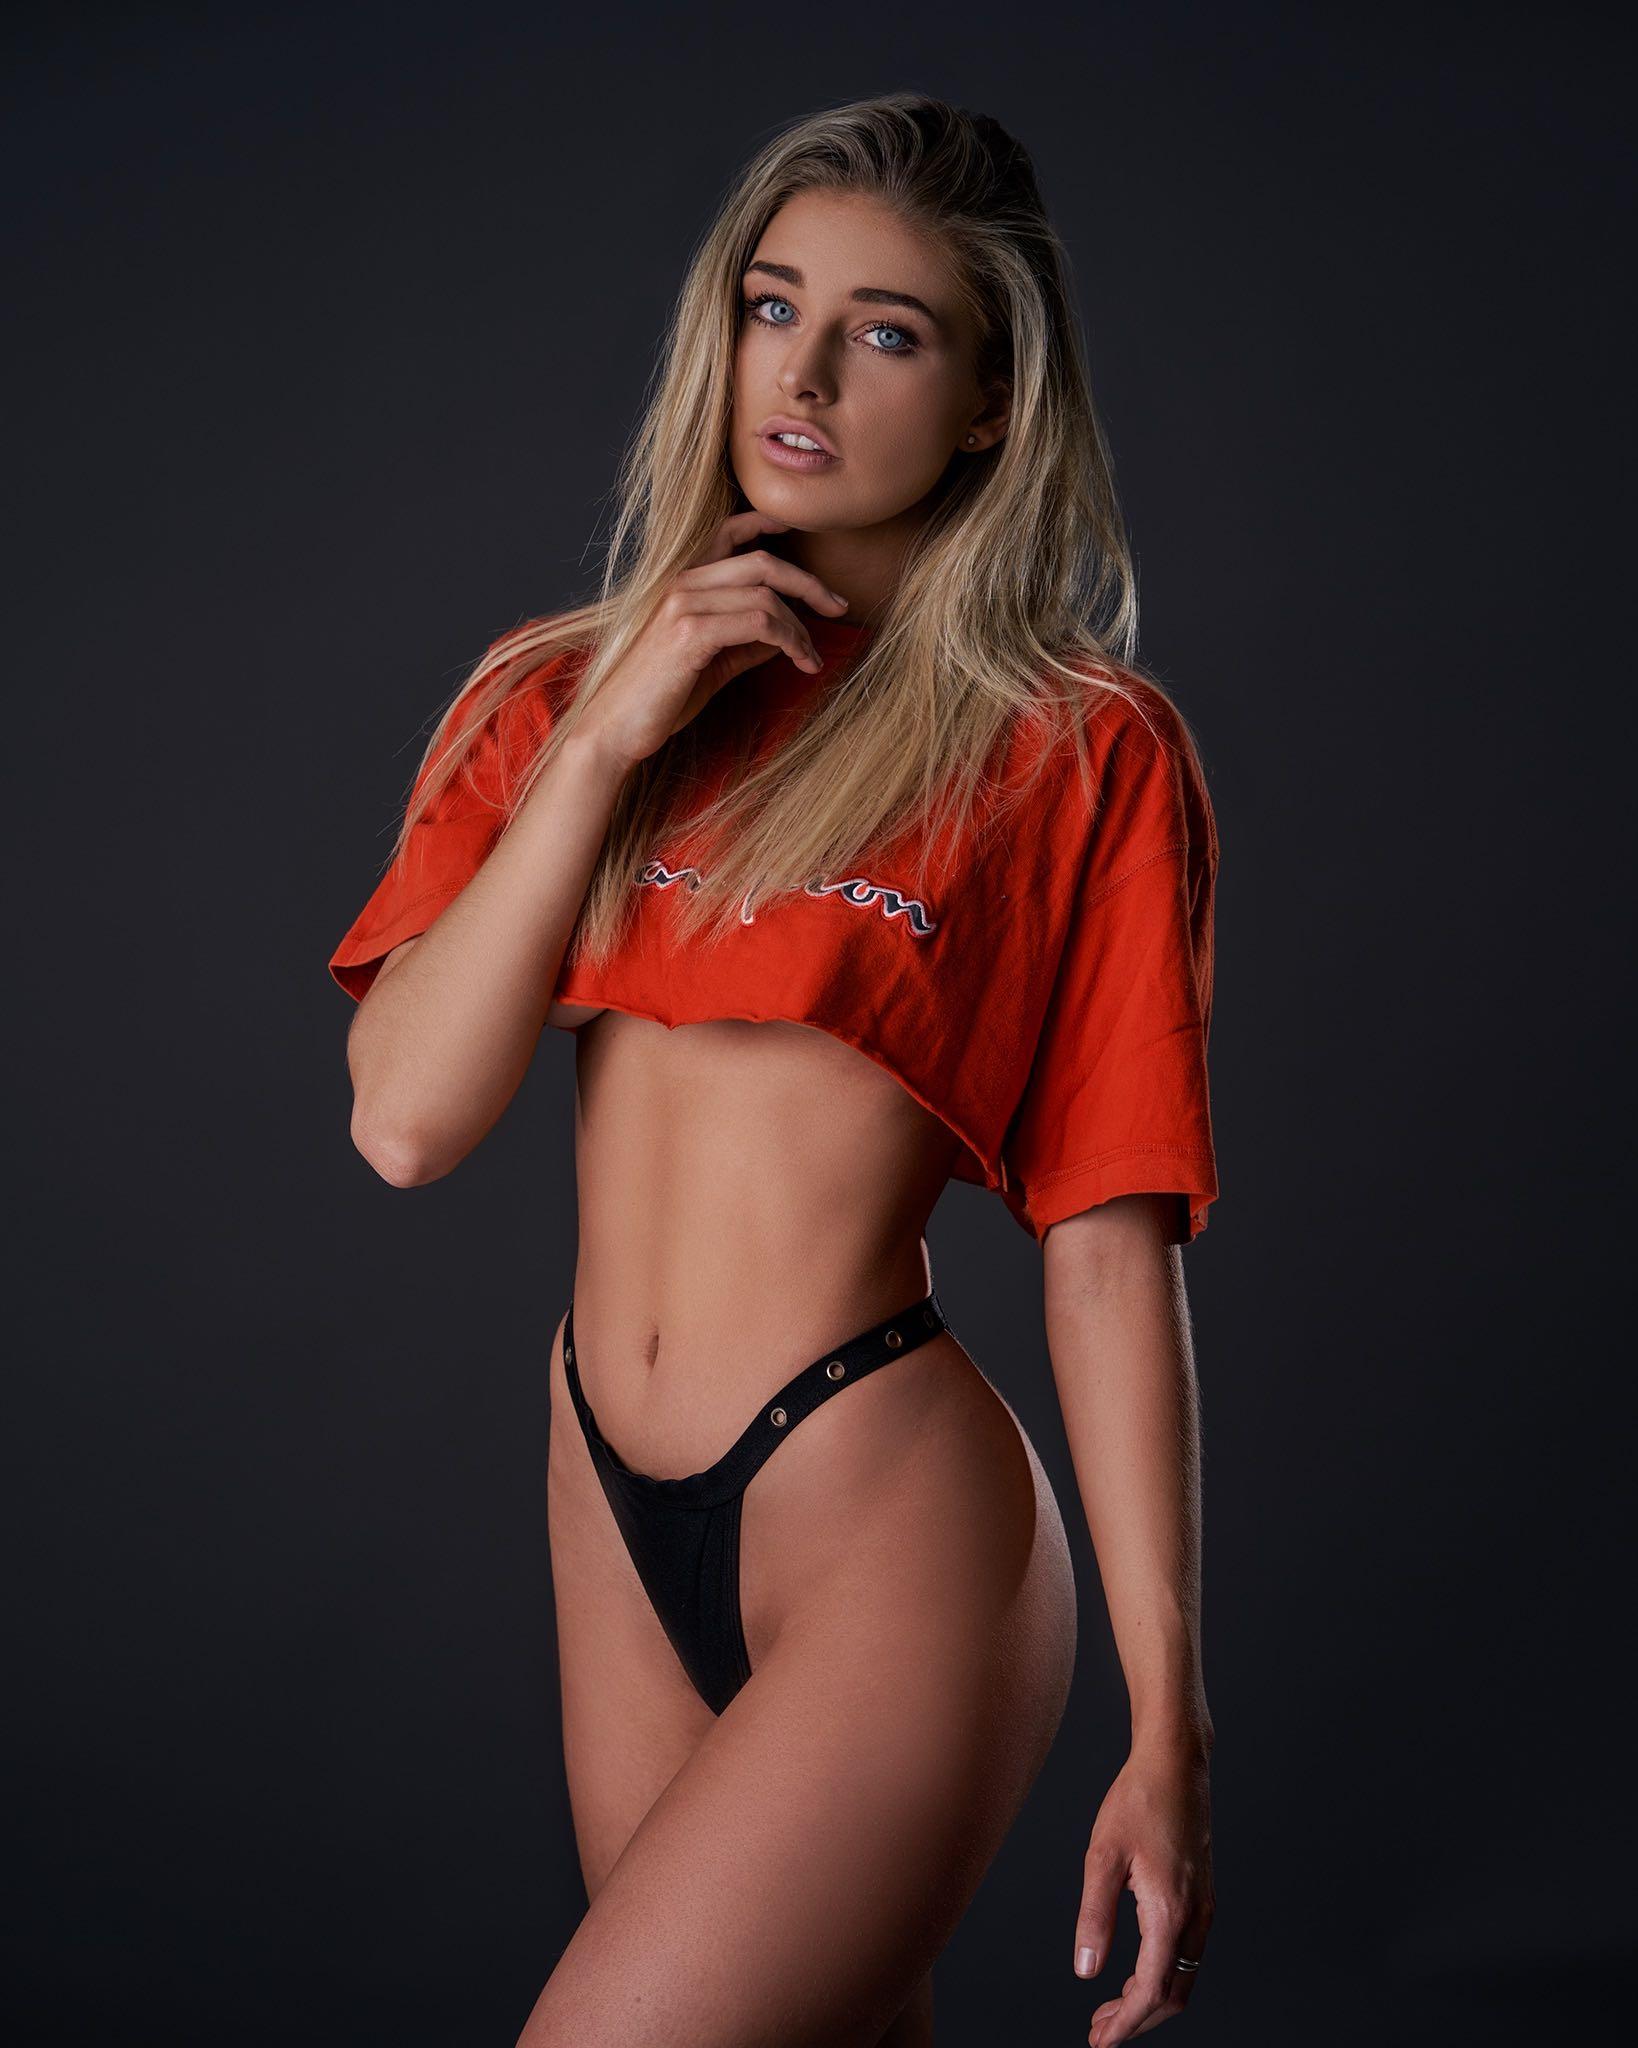 Meet Jocasta Durr in our SA Babes feature